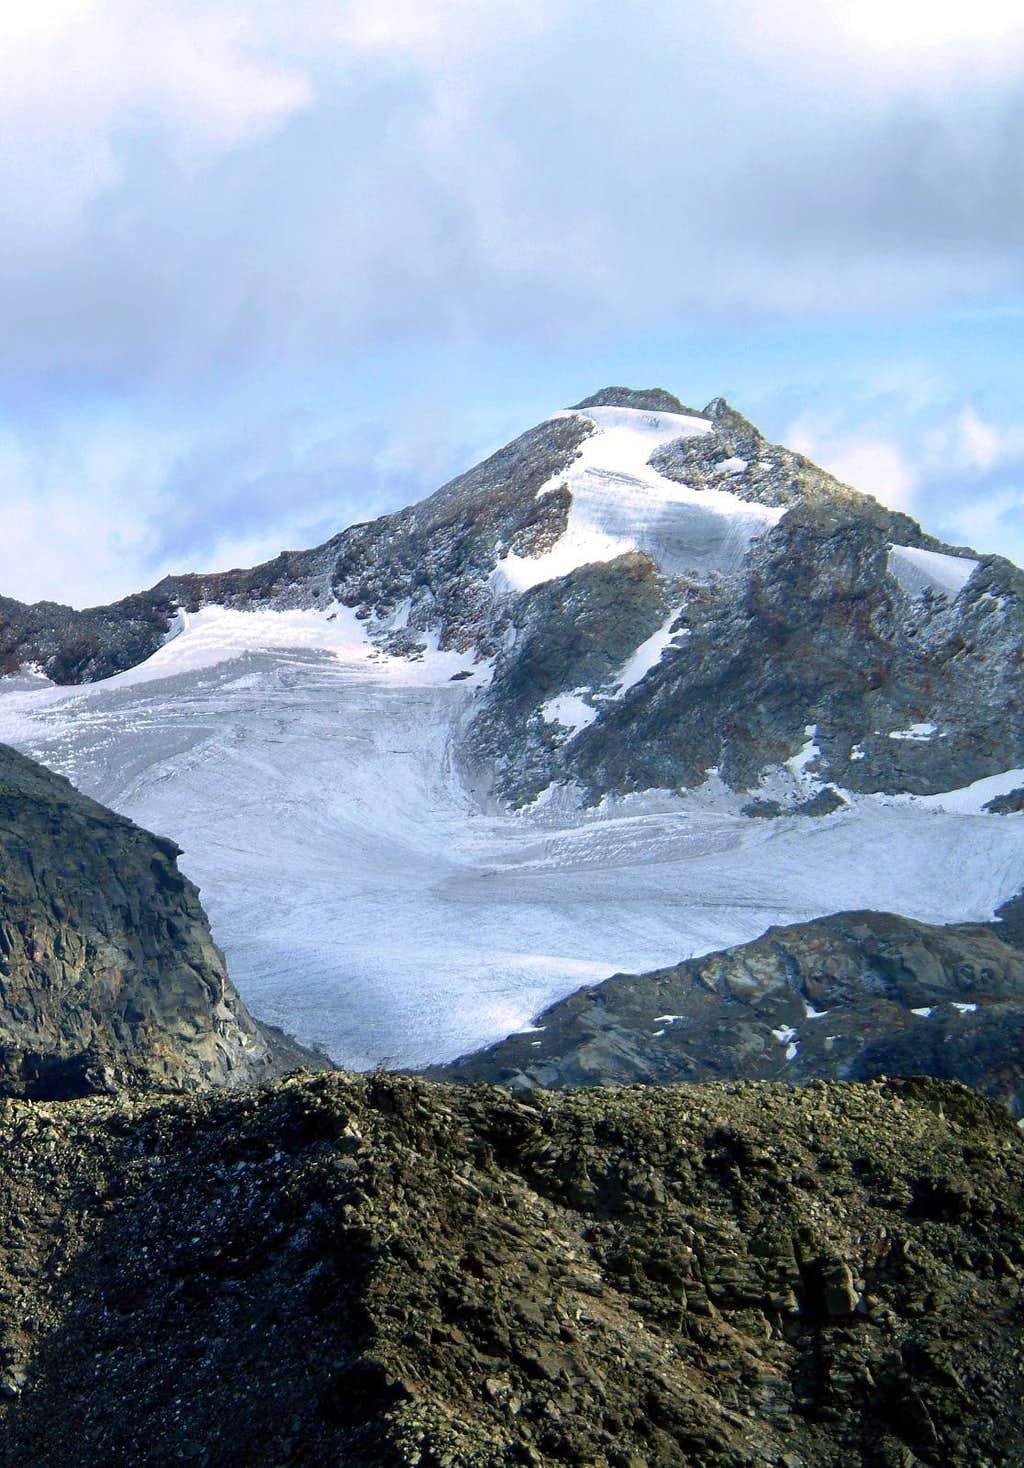 Usellettes Glacier